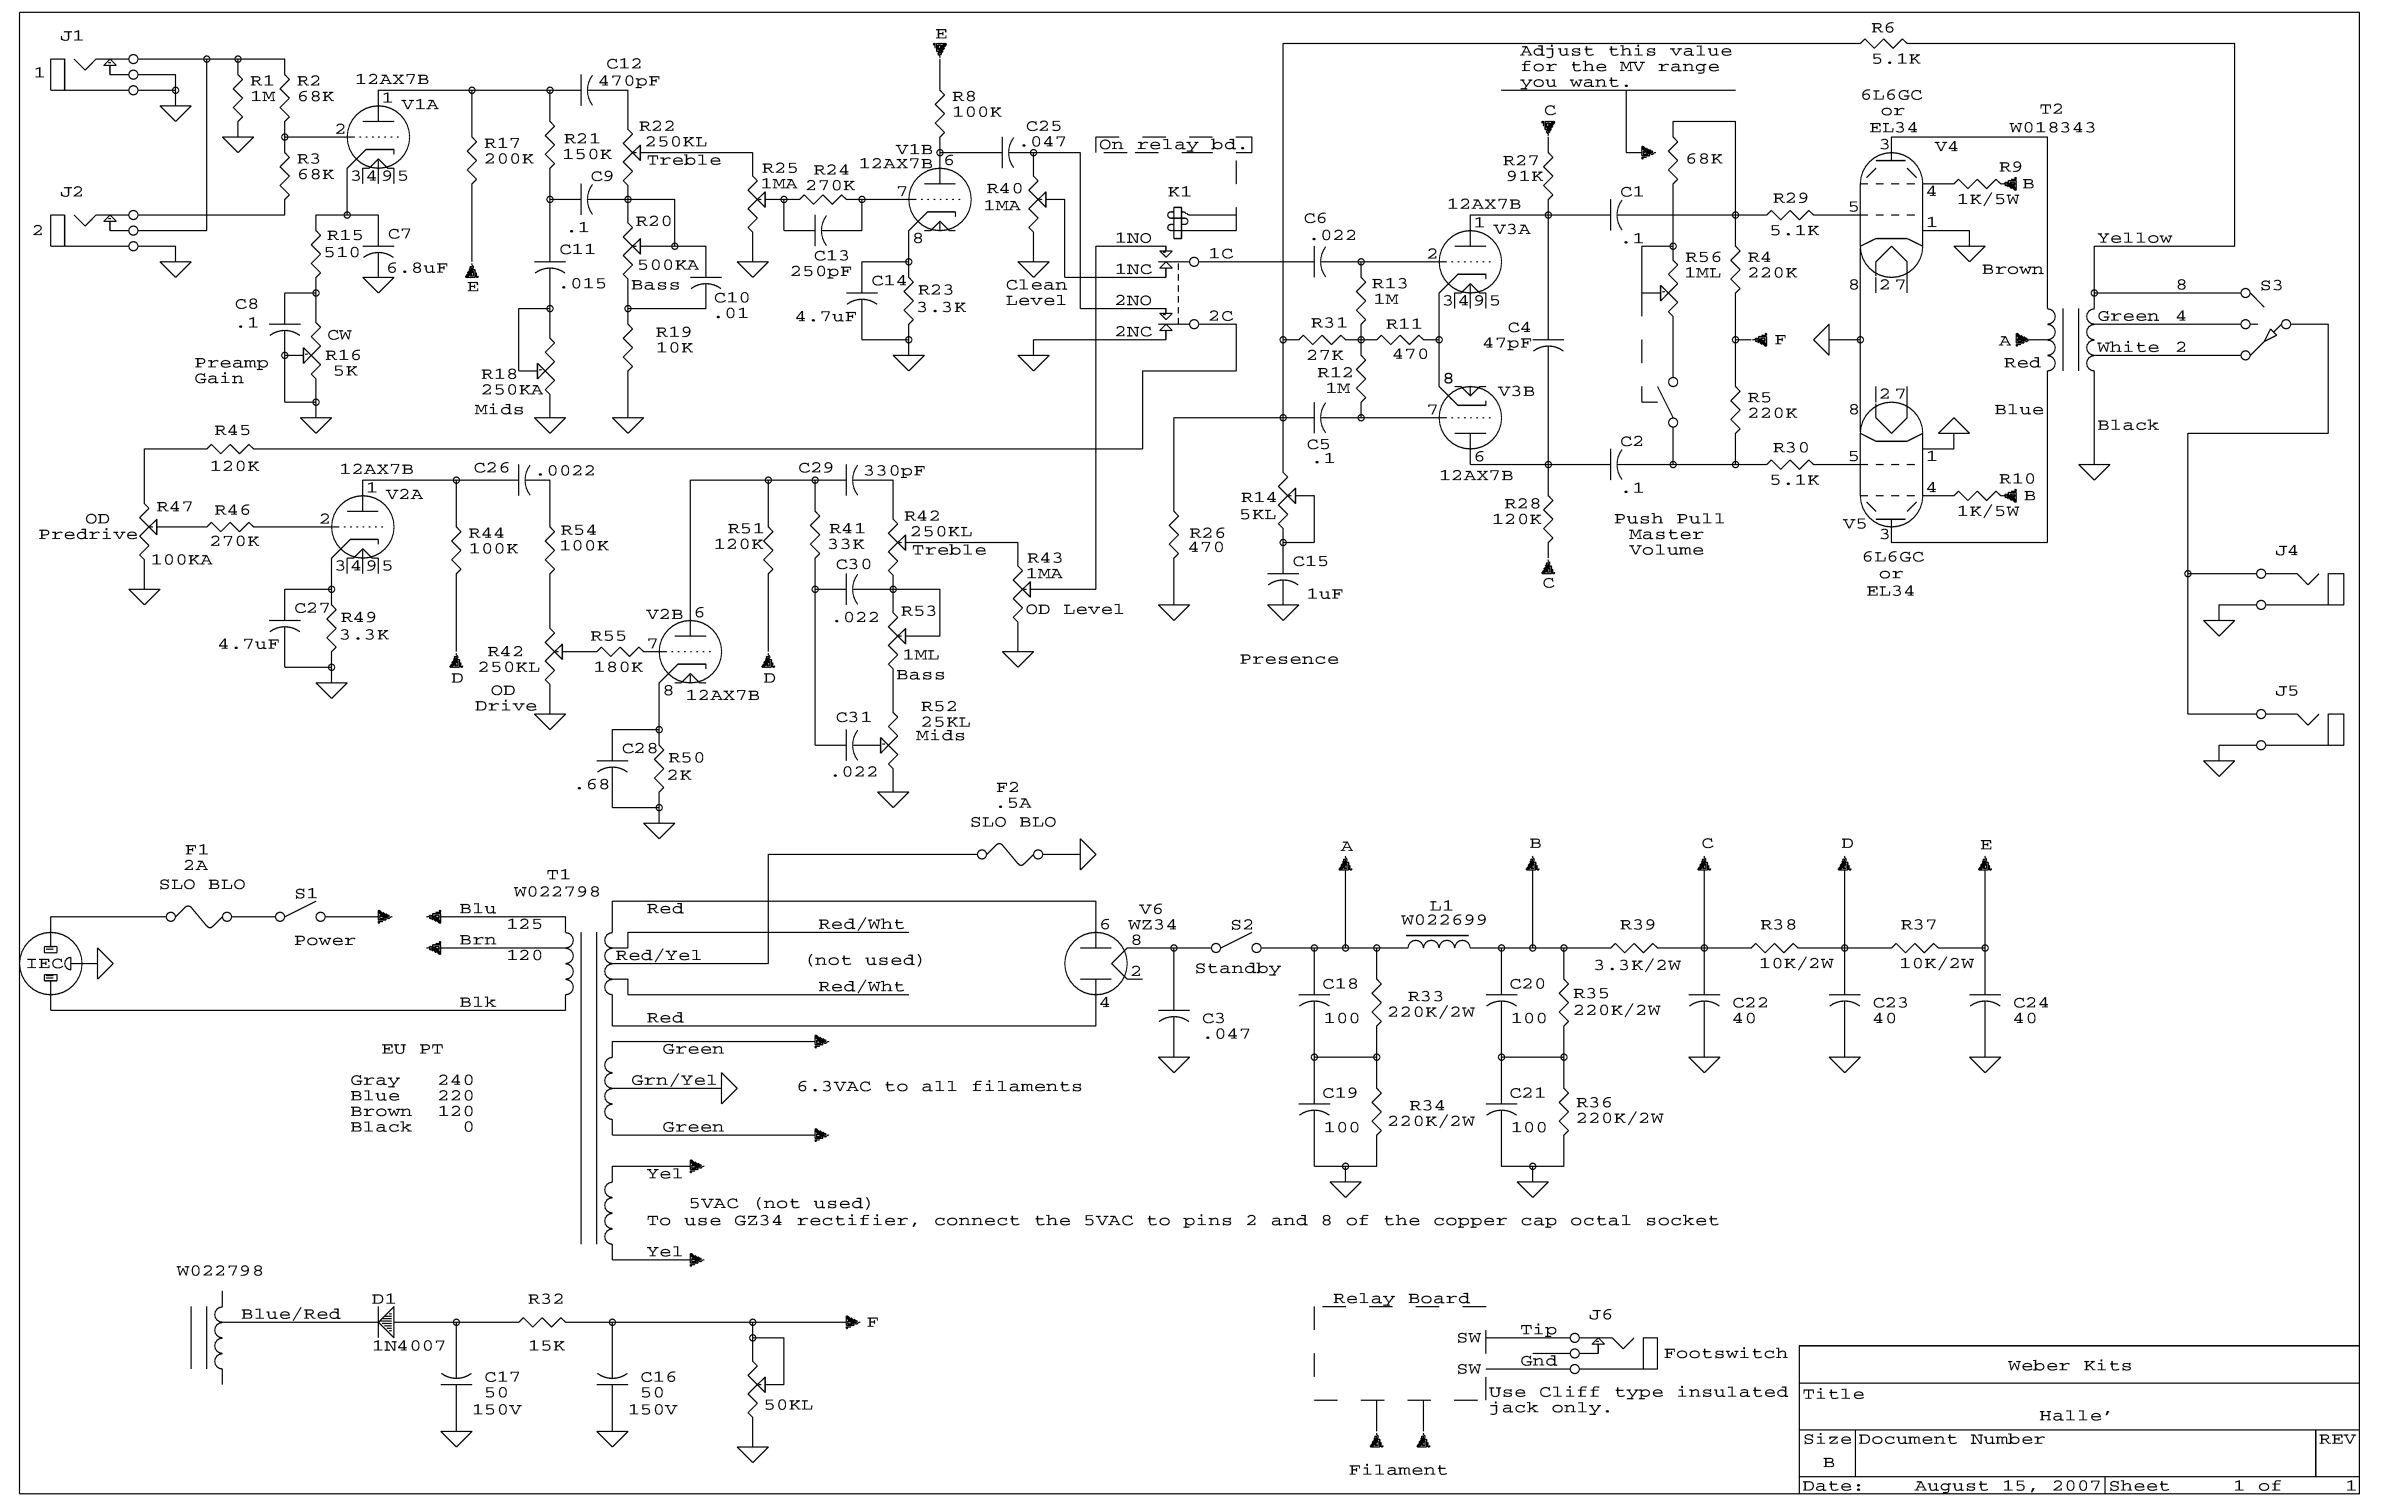 [TVPR_3874]  Elenco dei Kit di ampli a valvole con relativi link - 01 - diyitalia forum | Dumble Amp Wiring Diagram |  | diyitalia forum